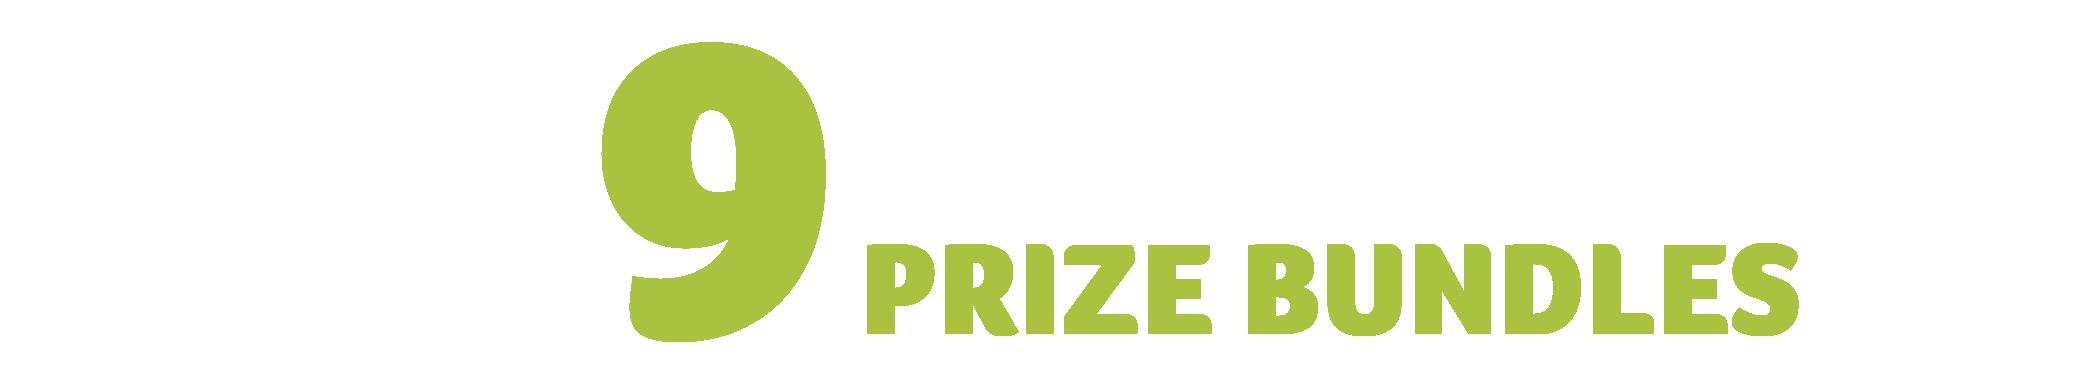 Fan-Awards-Website-Elements_Coin bundle prize